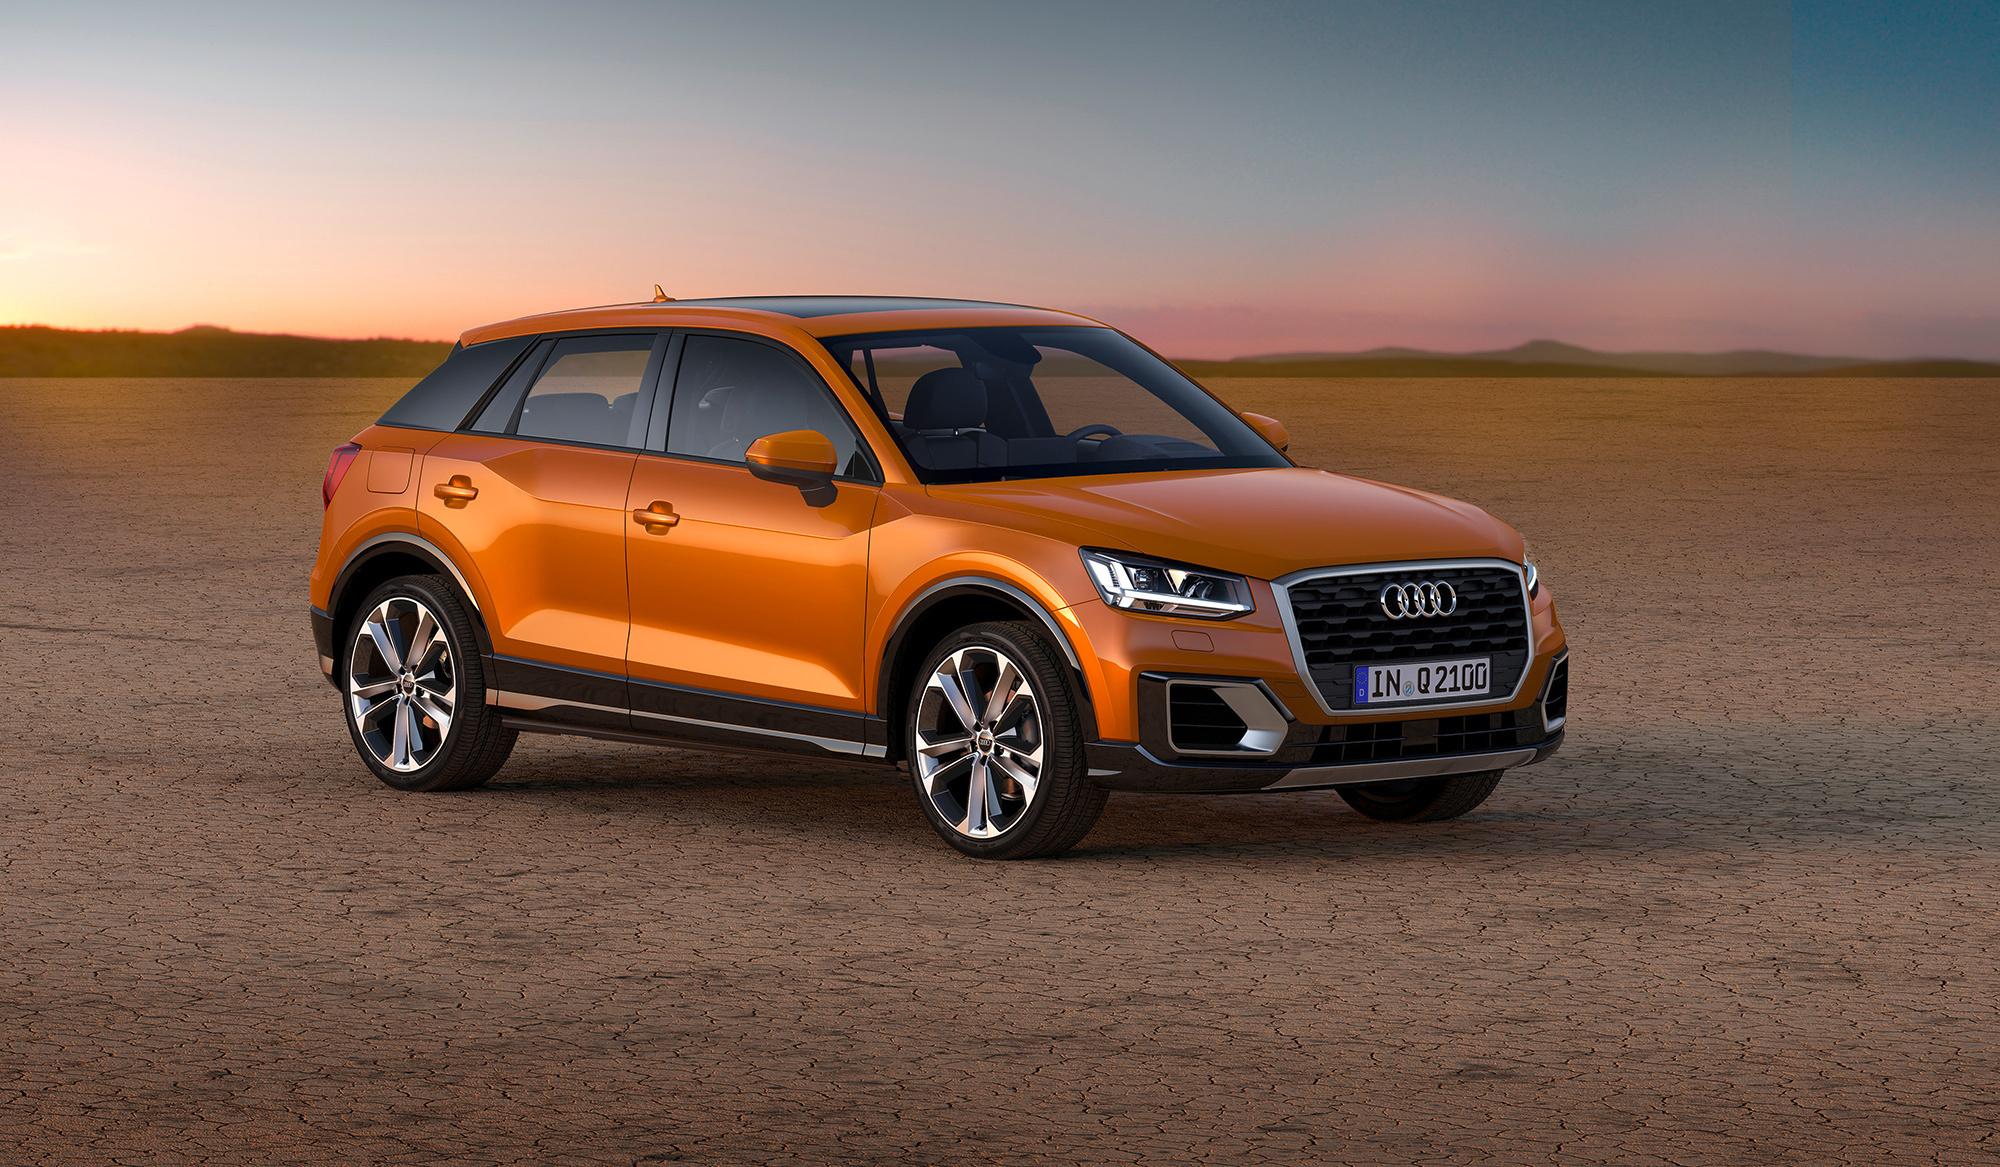 Audi Q2 Wallpapers HQ